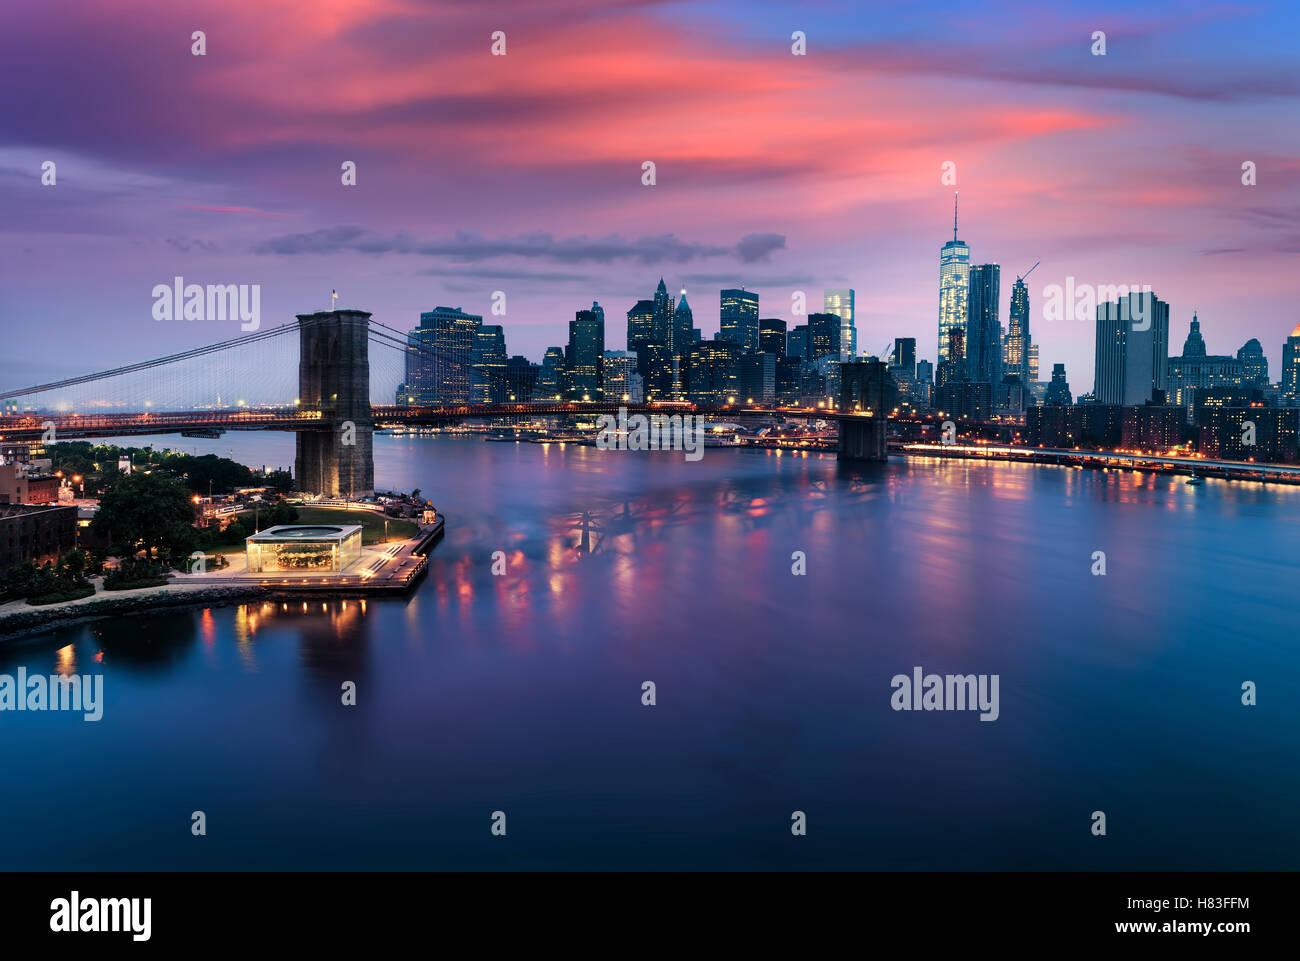 Manhattan and Brooklyn bridge at dusk, New York City USA - Stock Image